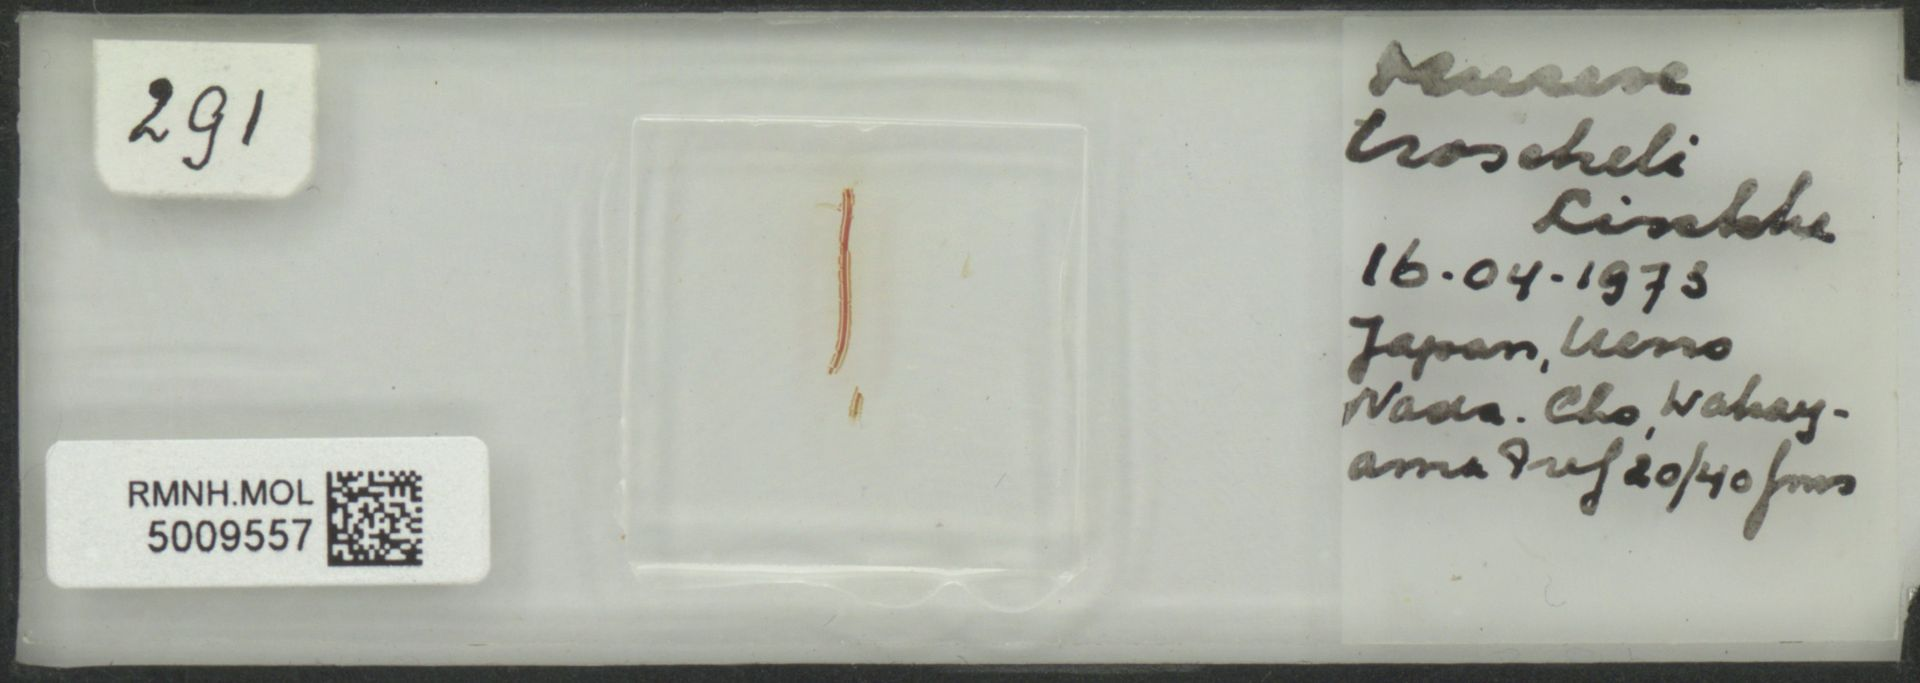 RMNH.MOL.5009557 | Murex troscheli Lischke, 1868